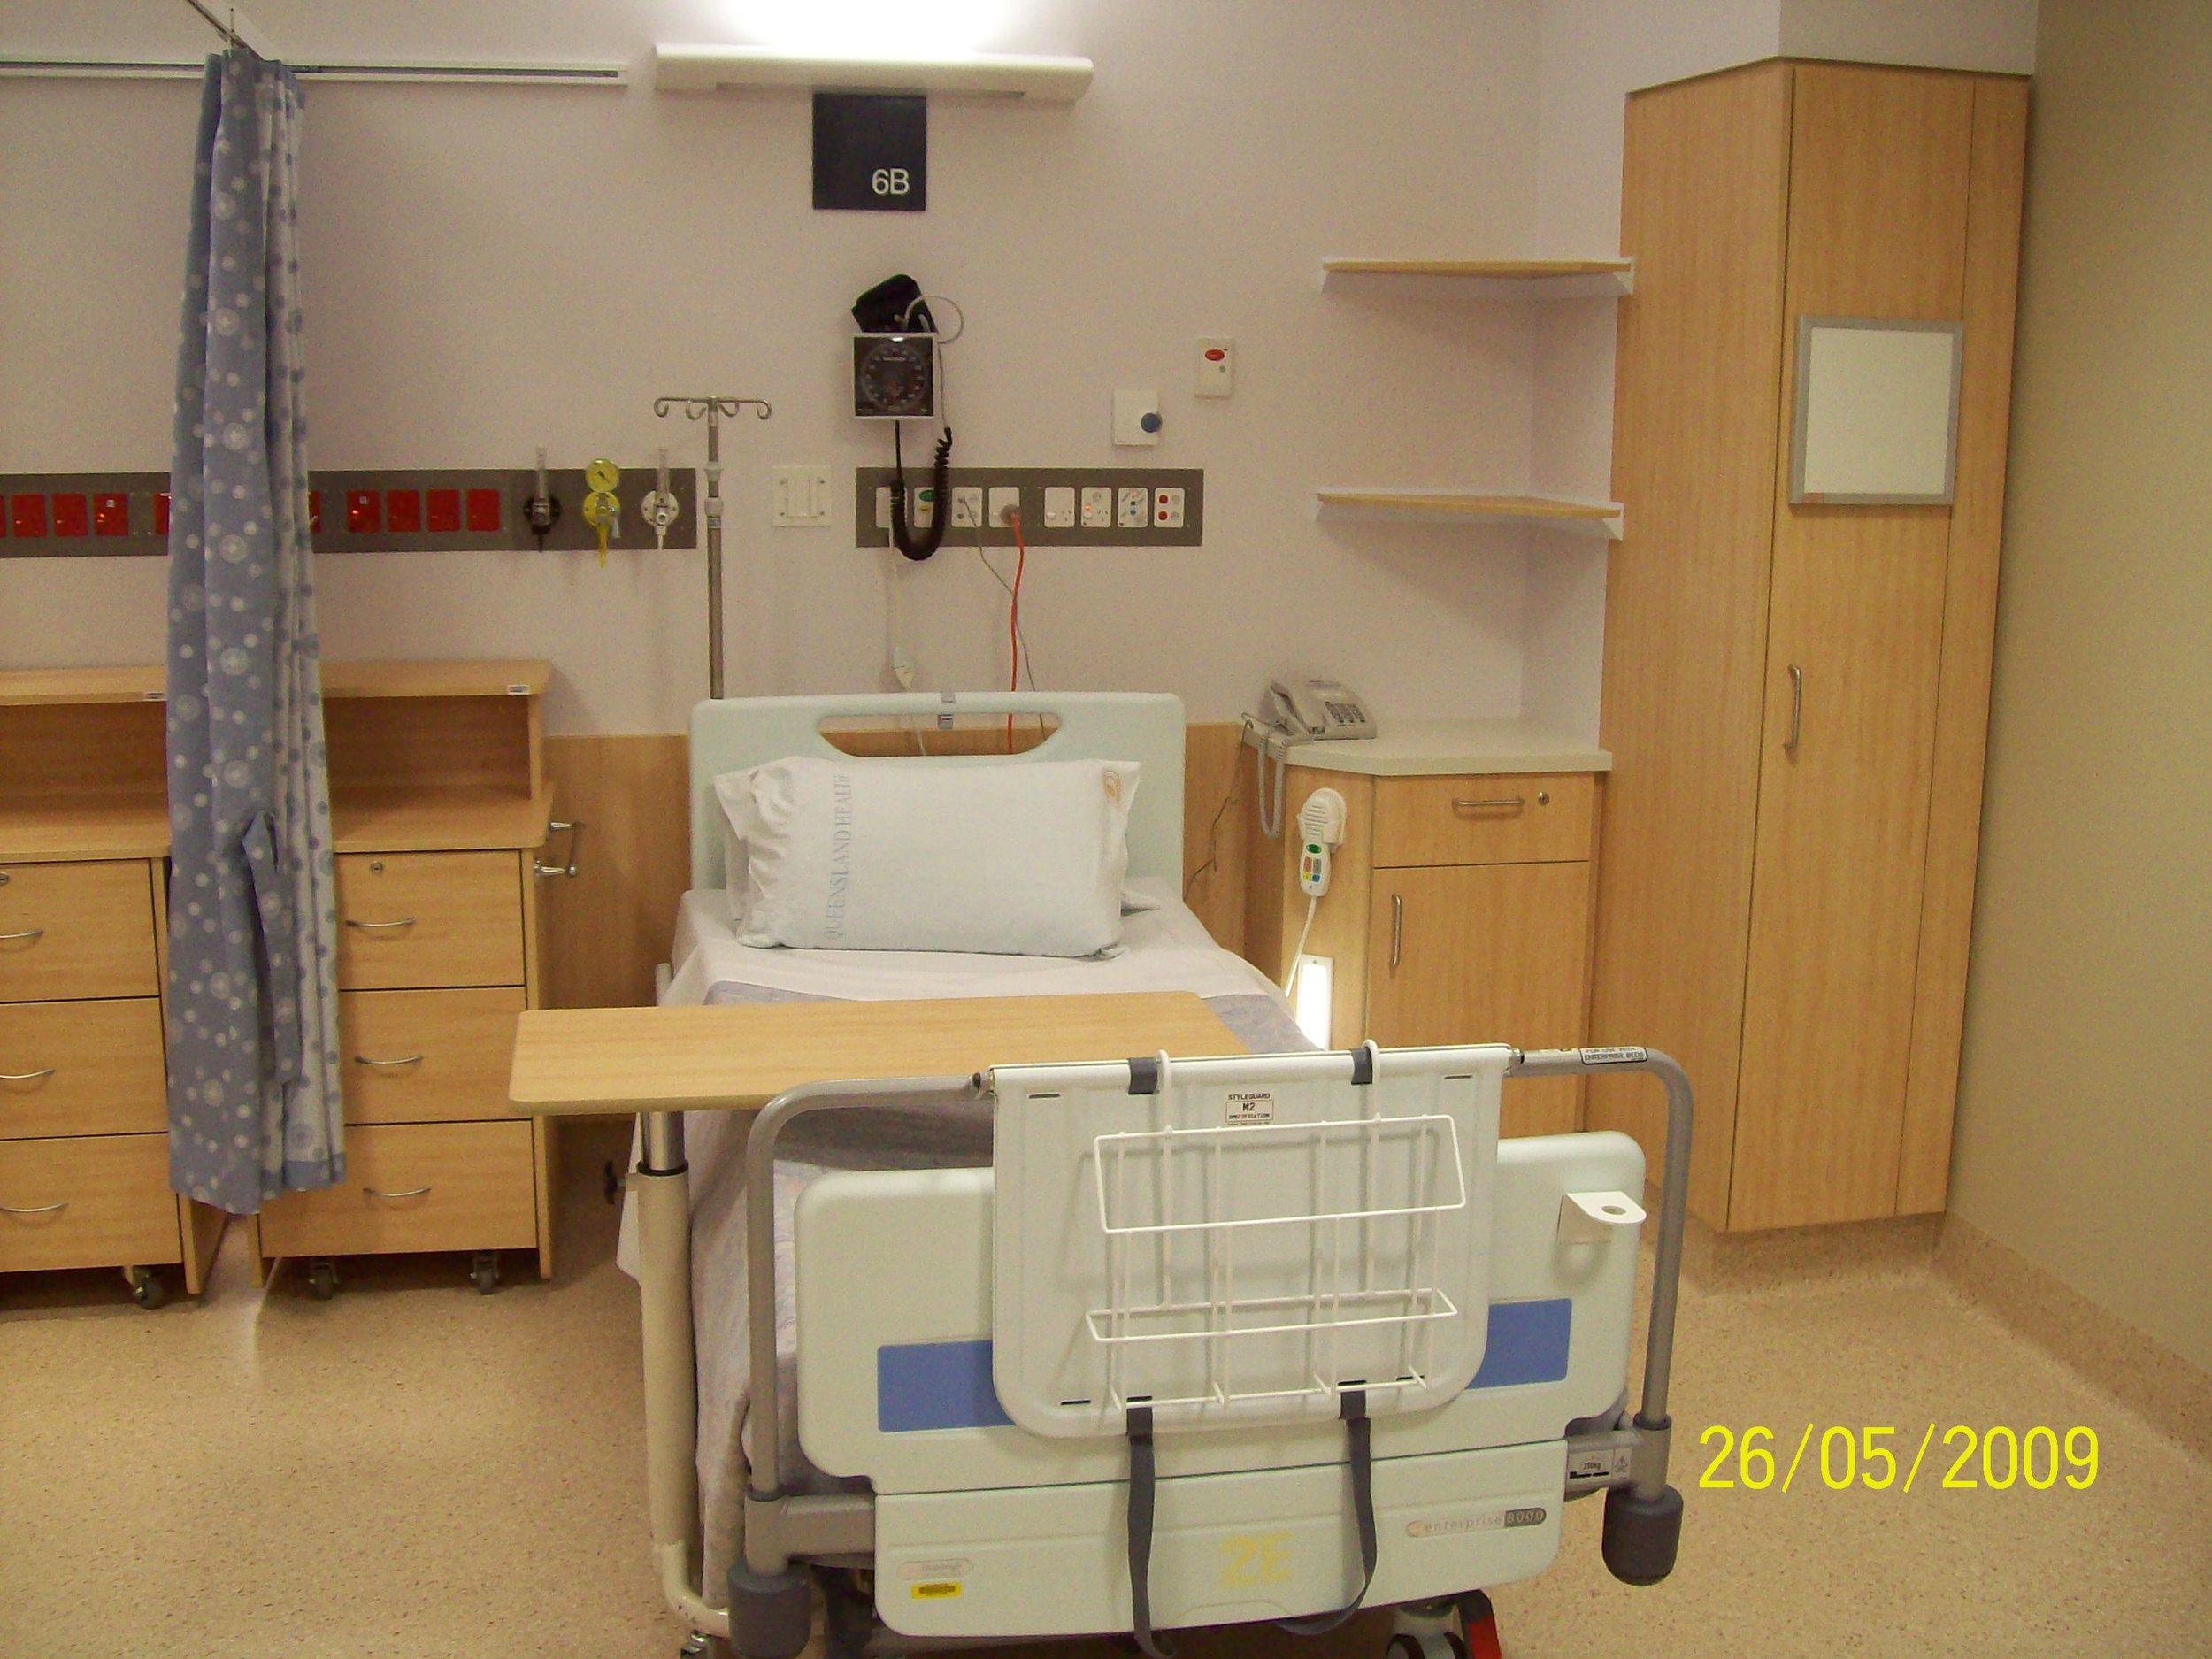 PCH L2 ward  1 of 2 beds.JPG